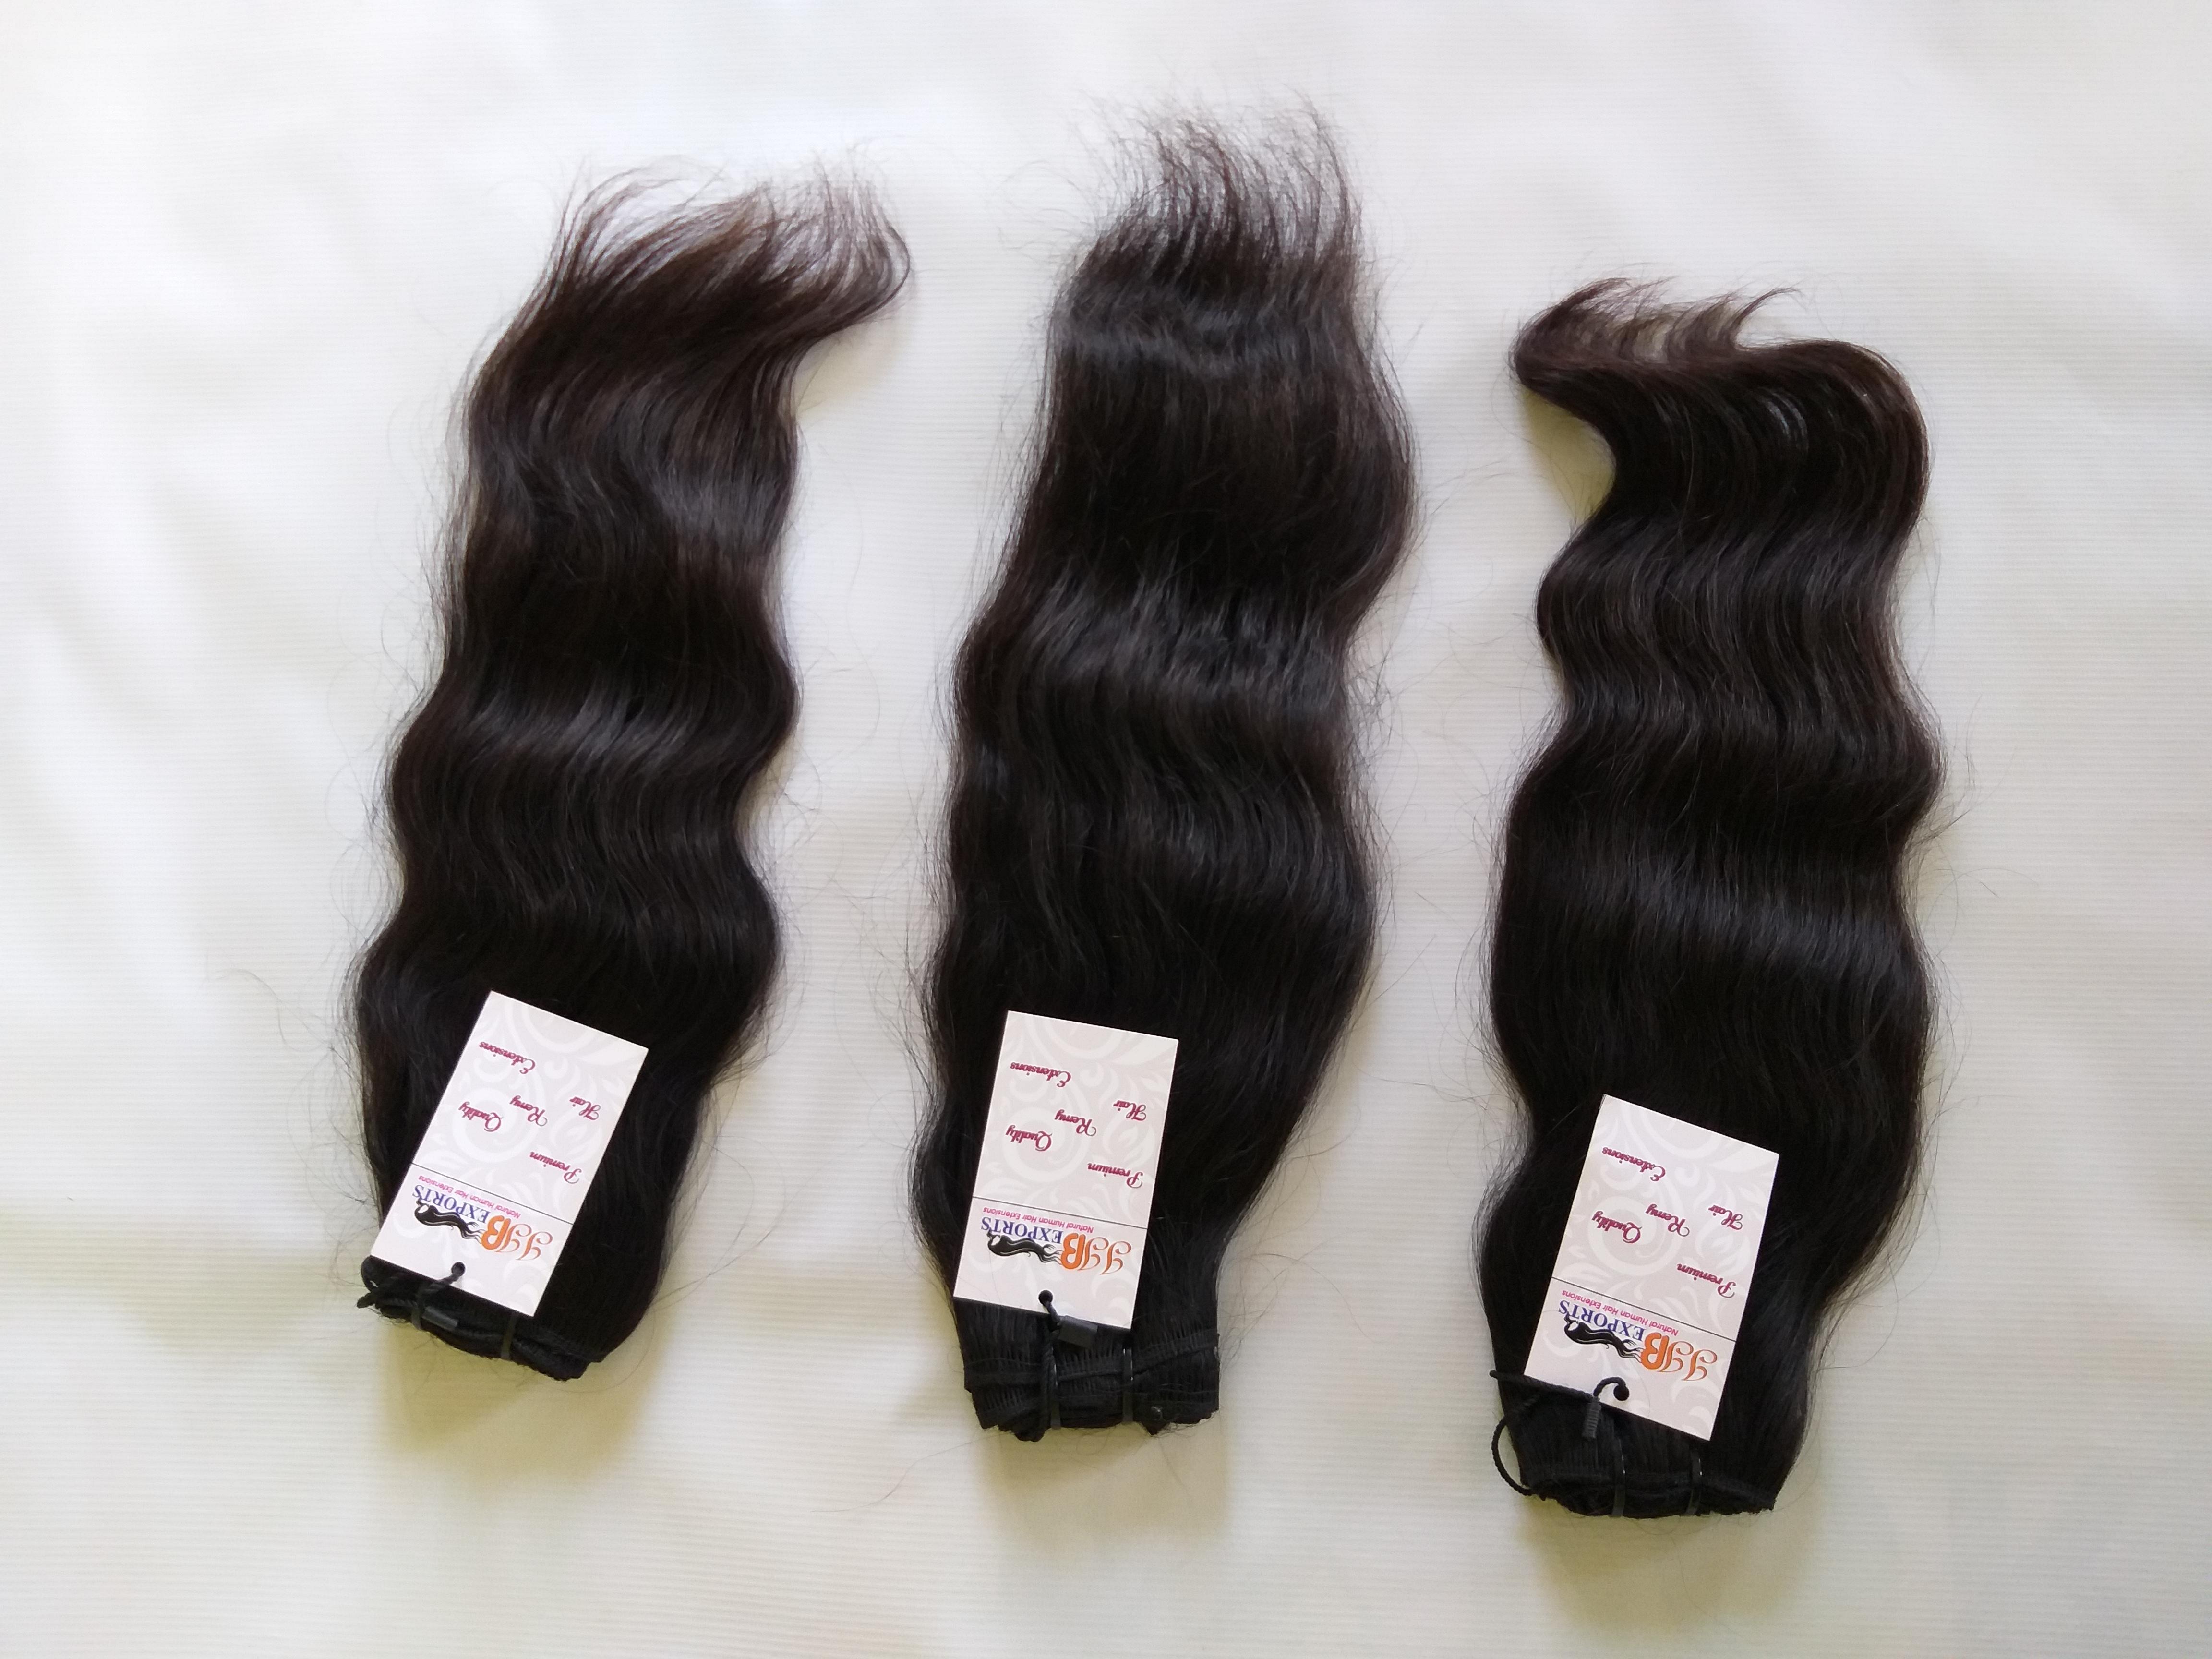 100% Raw Virgin Indian Human Hair,10A Grade Hair Peruvian Virgin Wavy Straight Human Hair Extensions